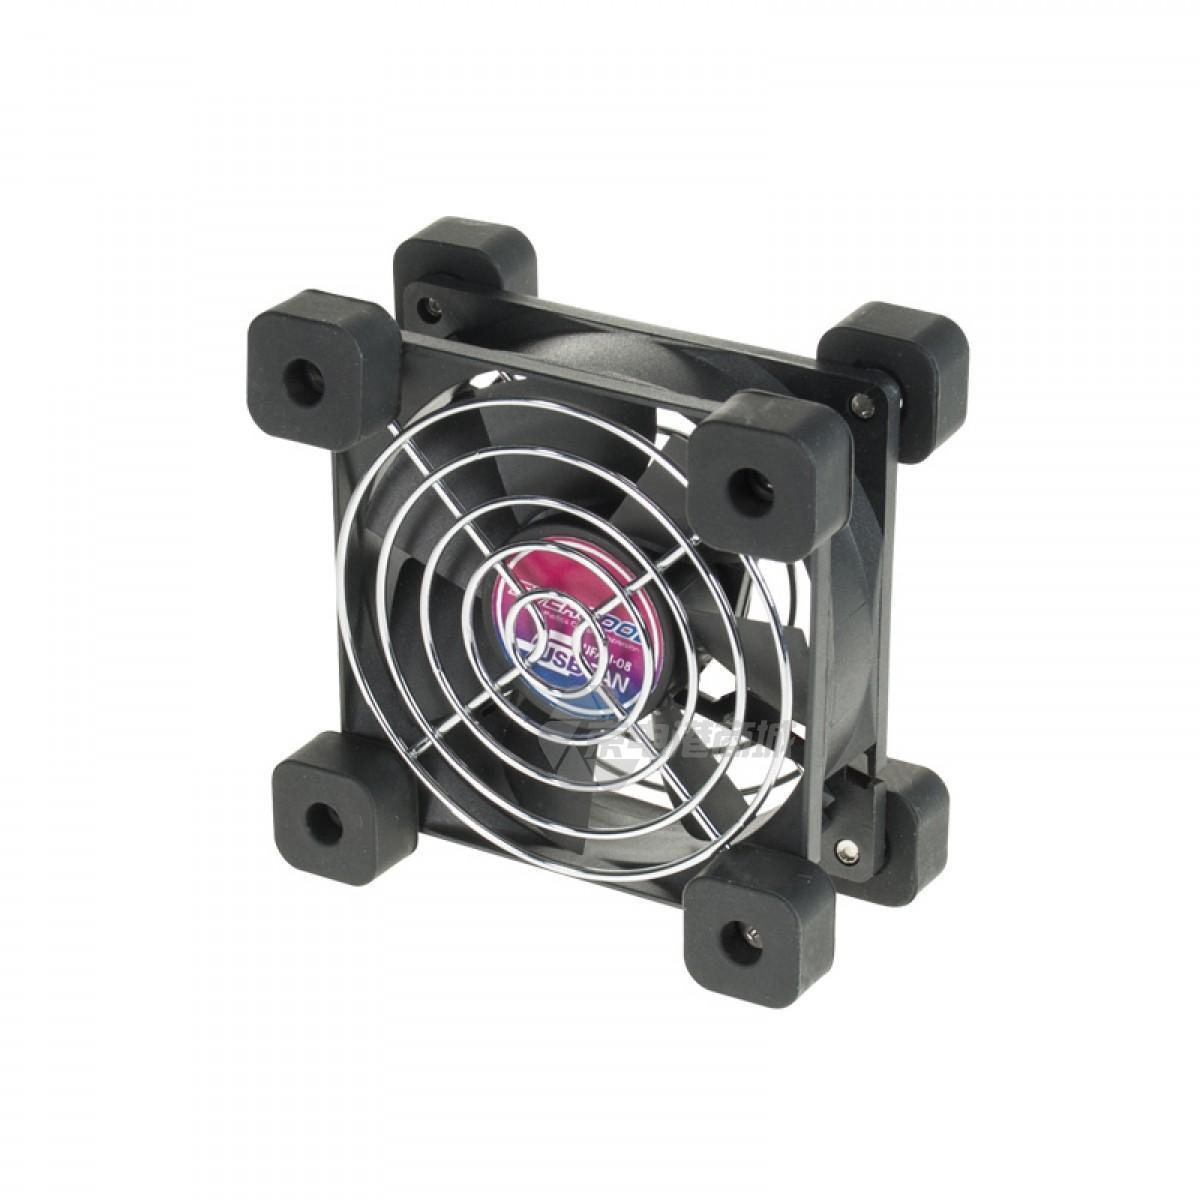 EVERCOOL UFAN 08 5VDC 80x80x25mm EL bearing